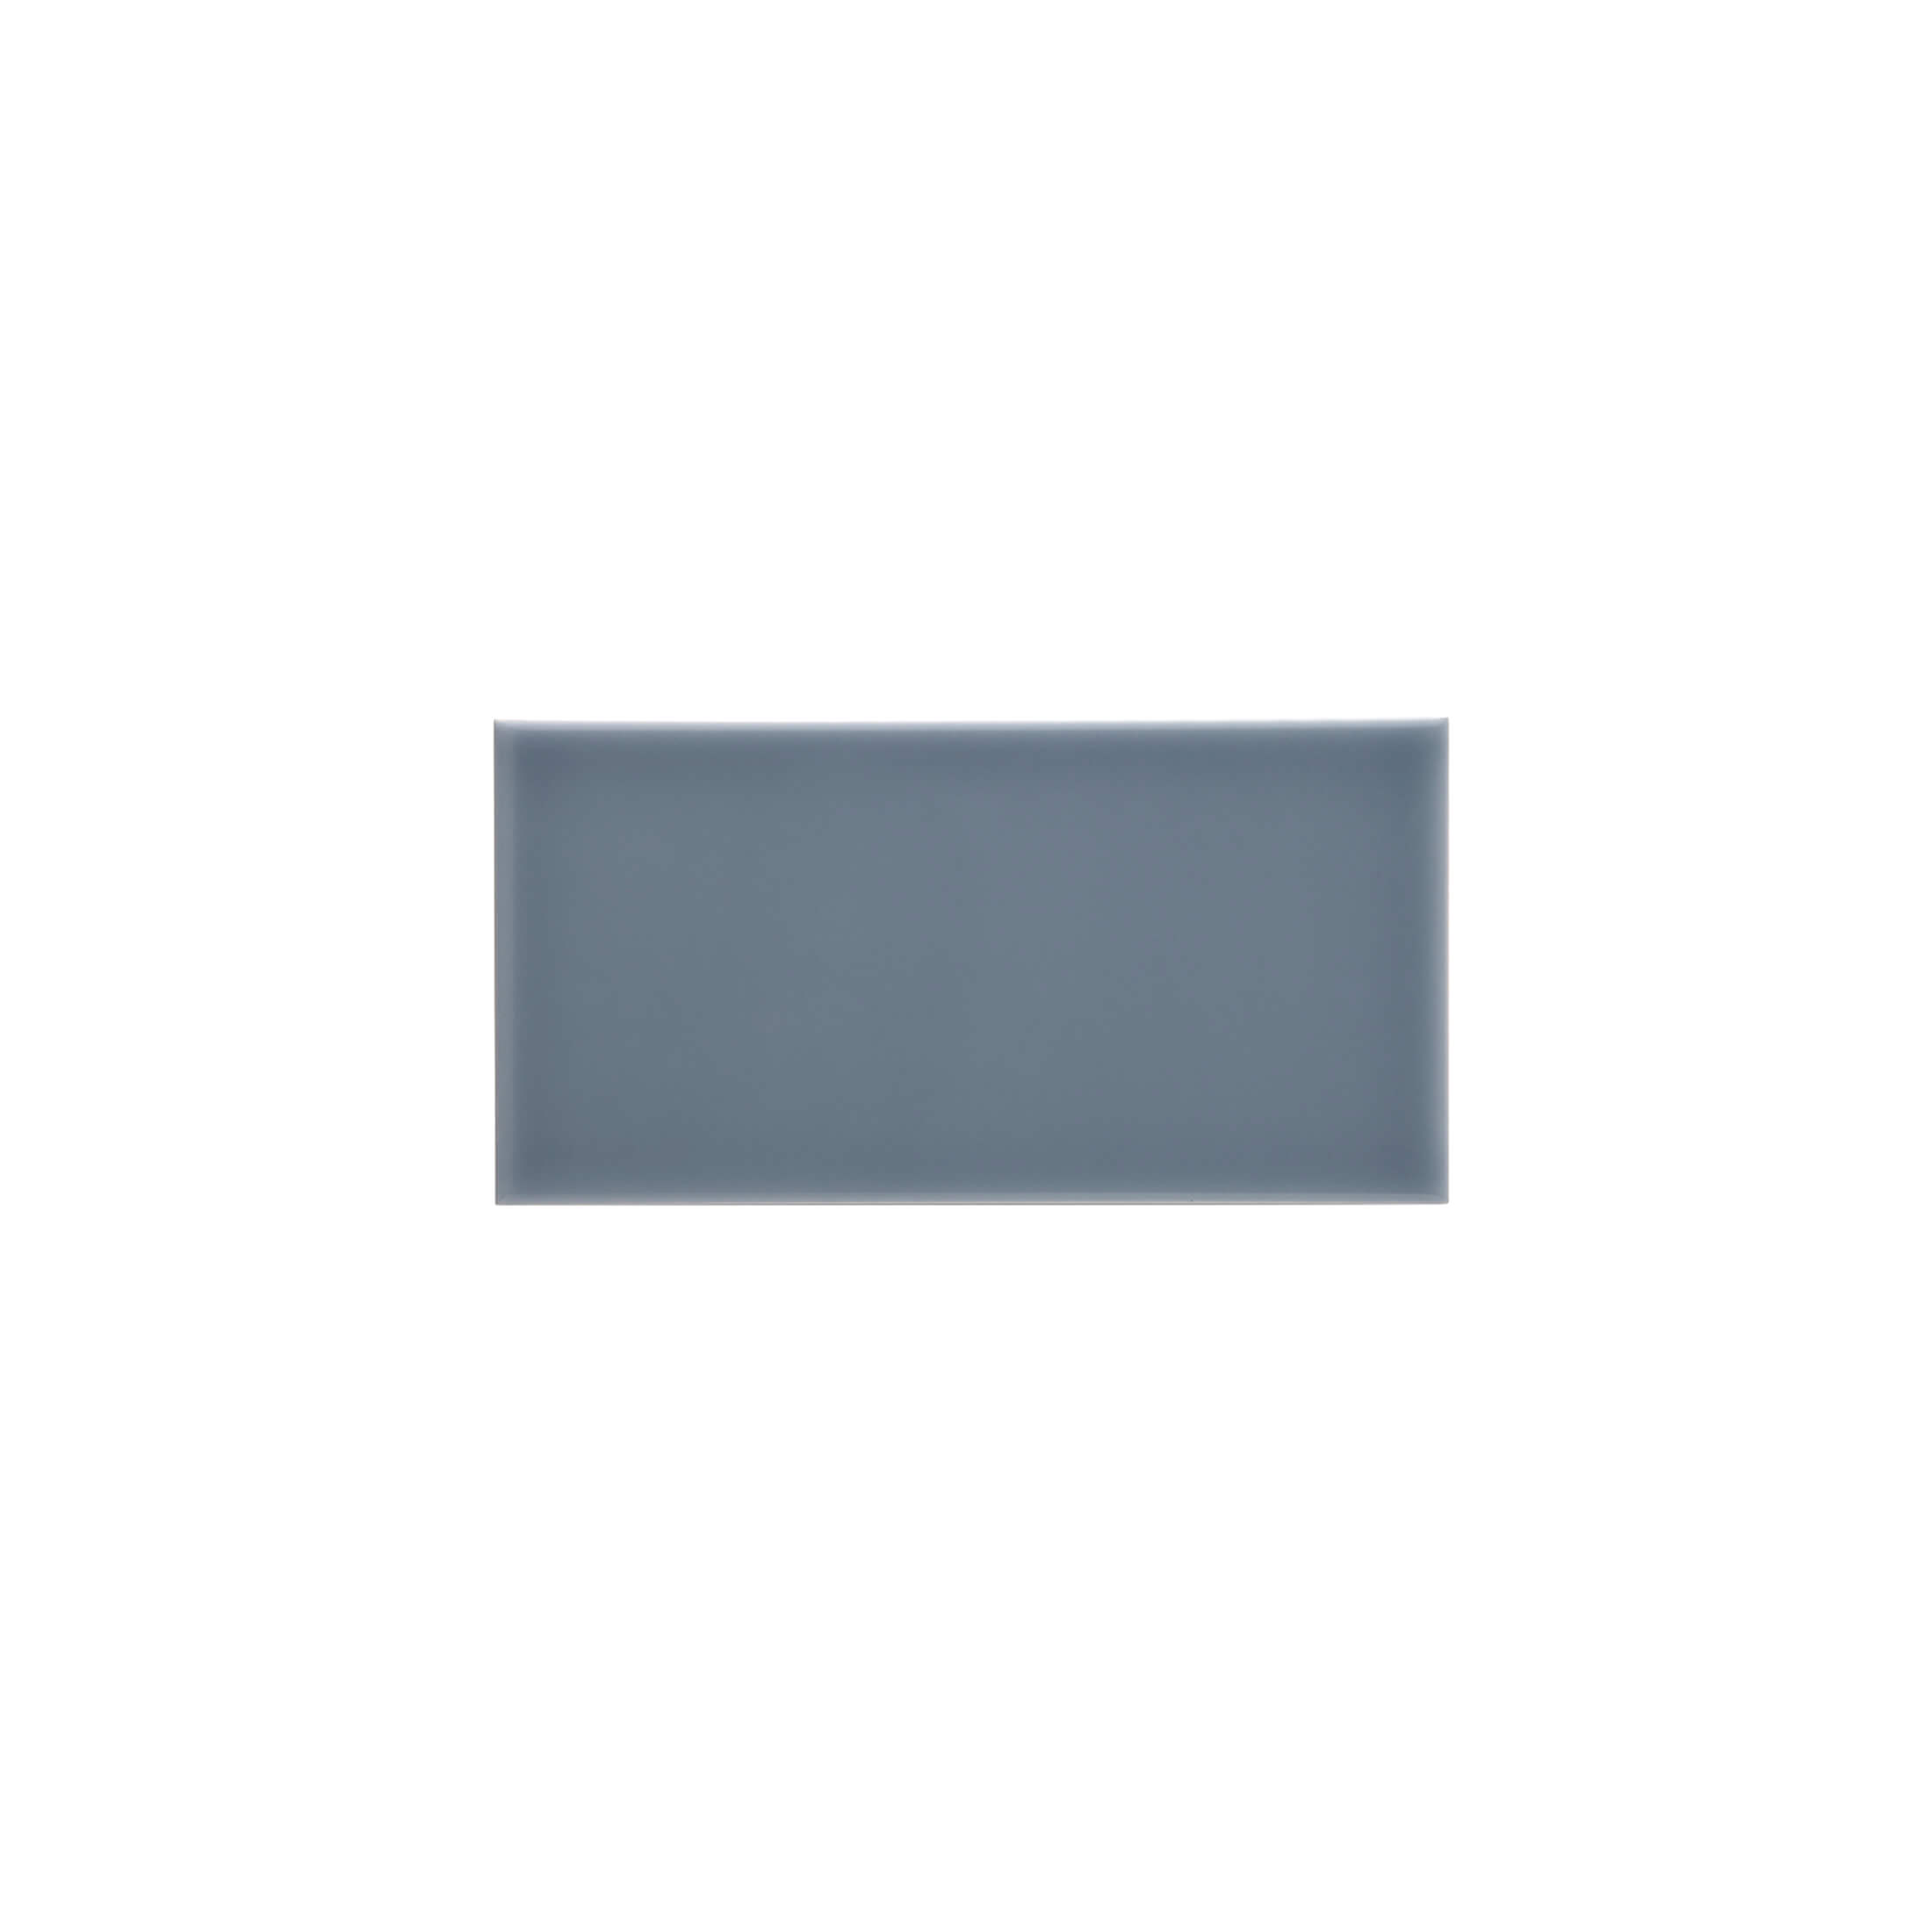 ADNE1097 - LISO PB - 7.5 cm X 15 cm